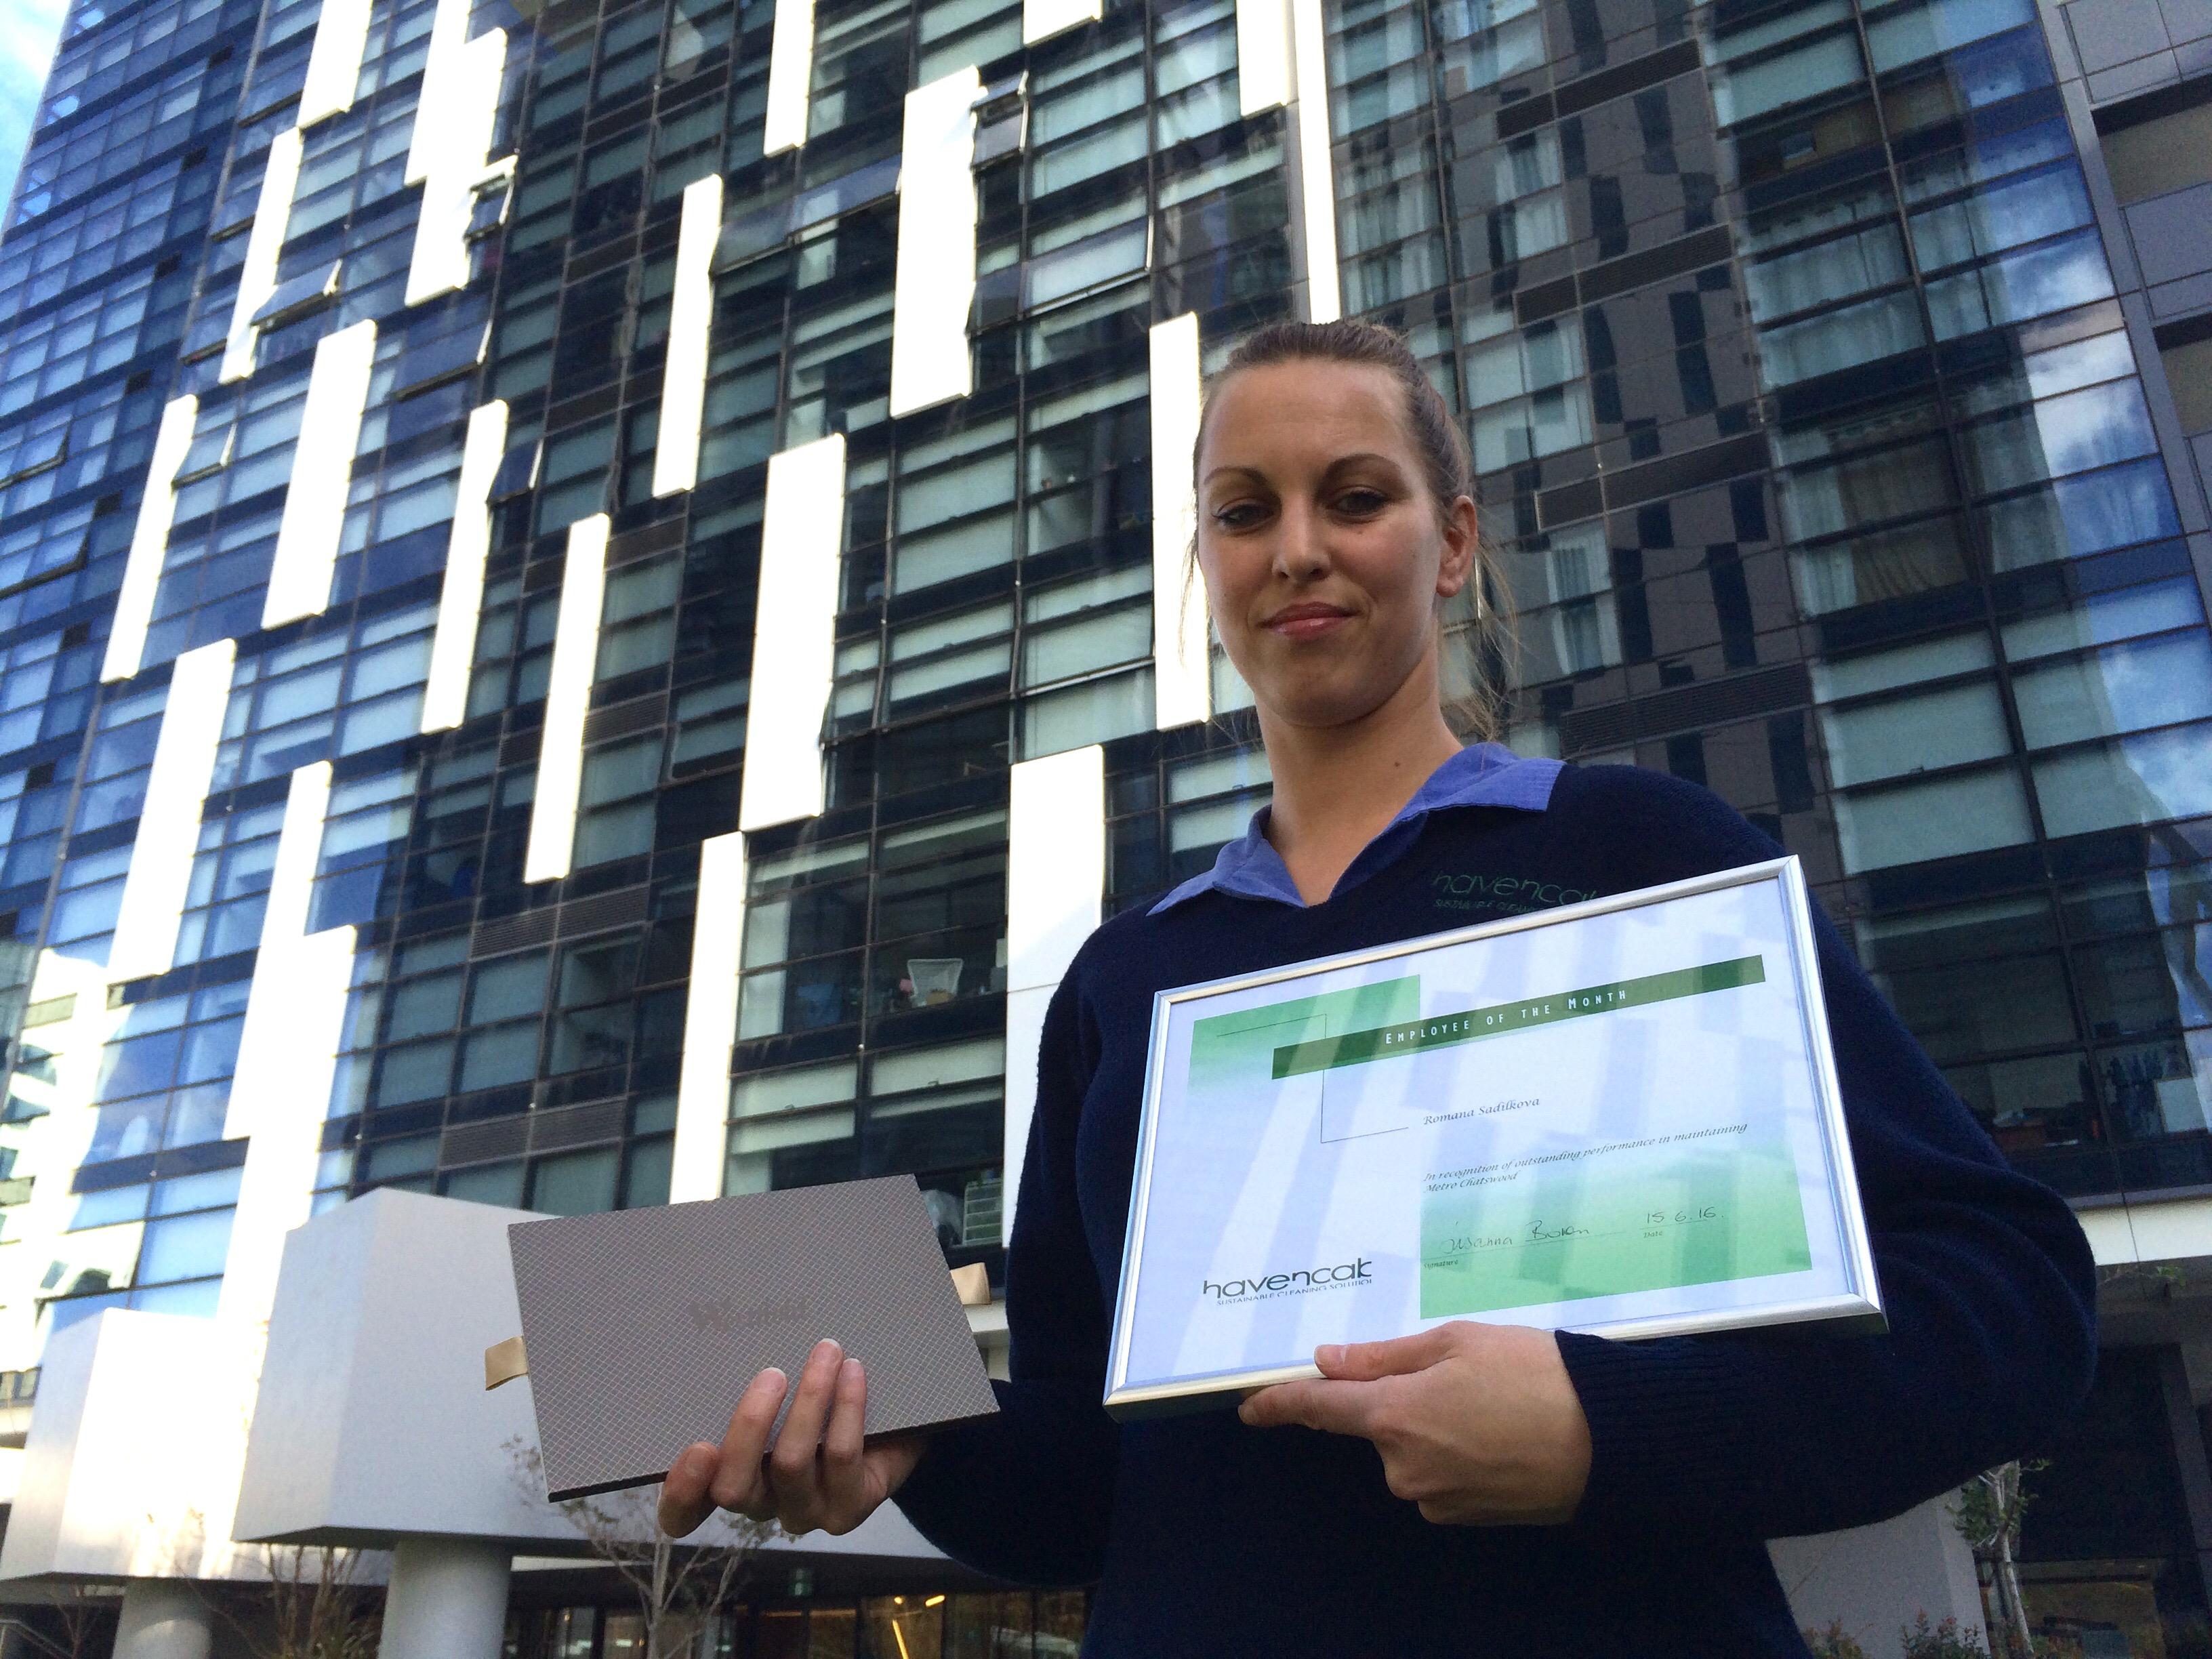 Havencab Employee of the Month Romana Sidilkova